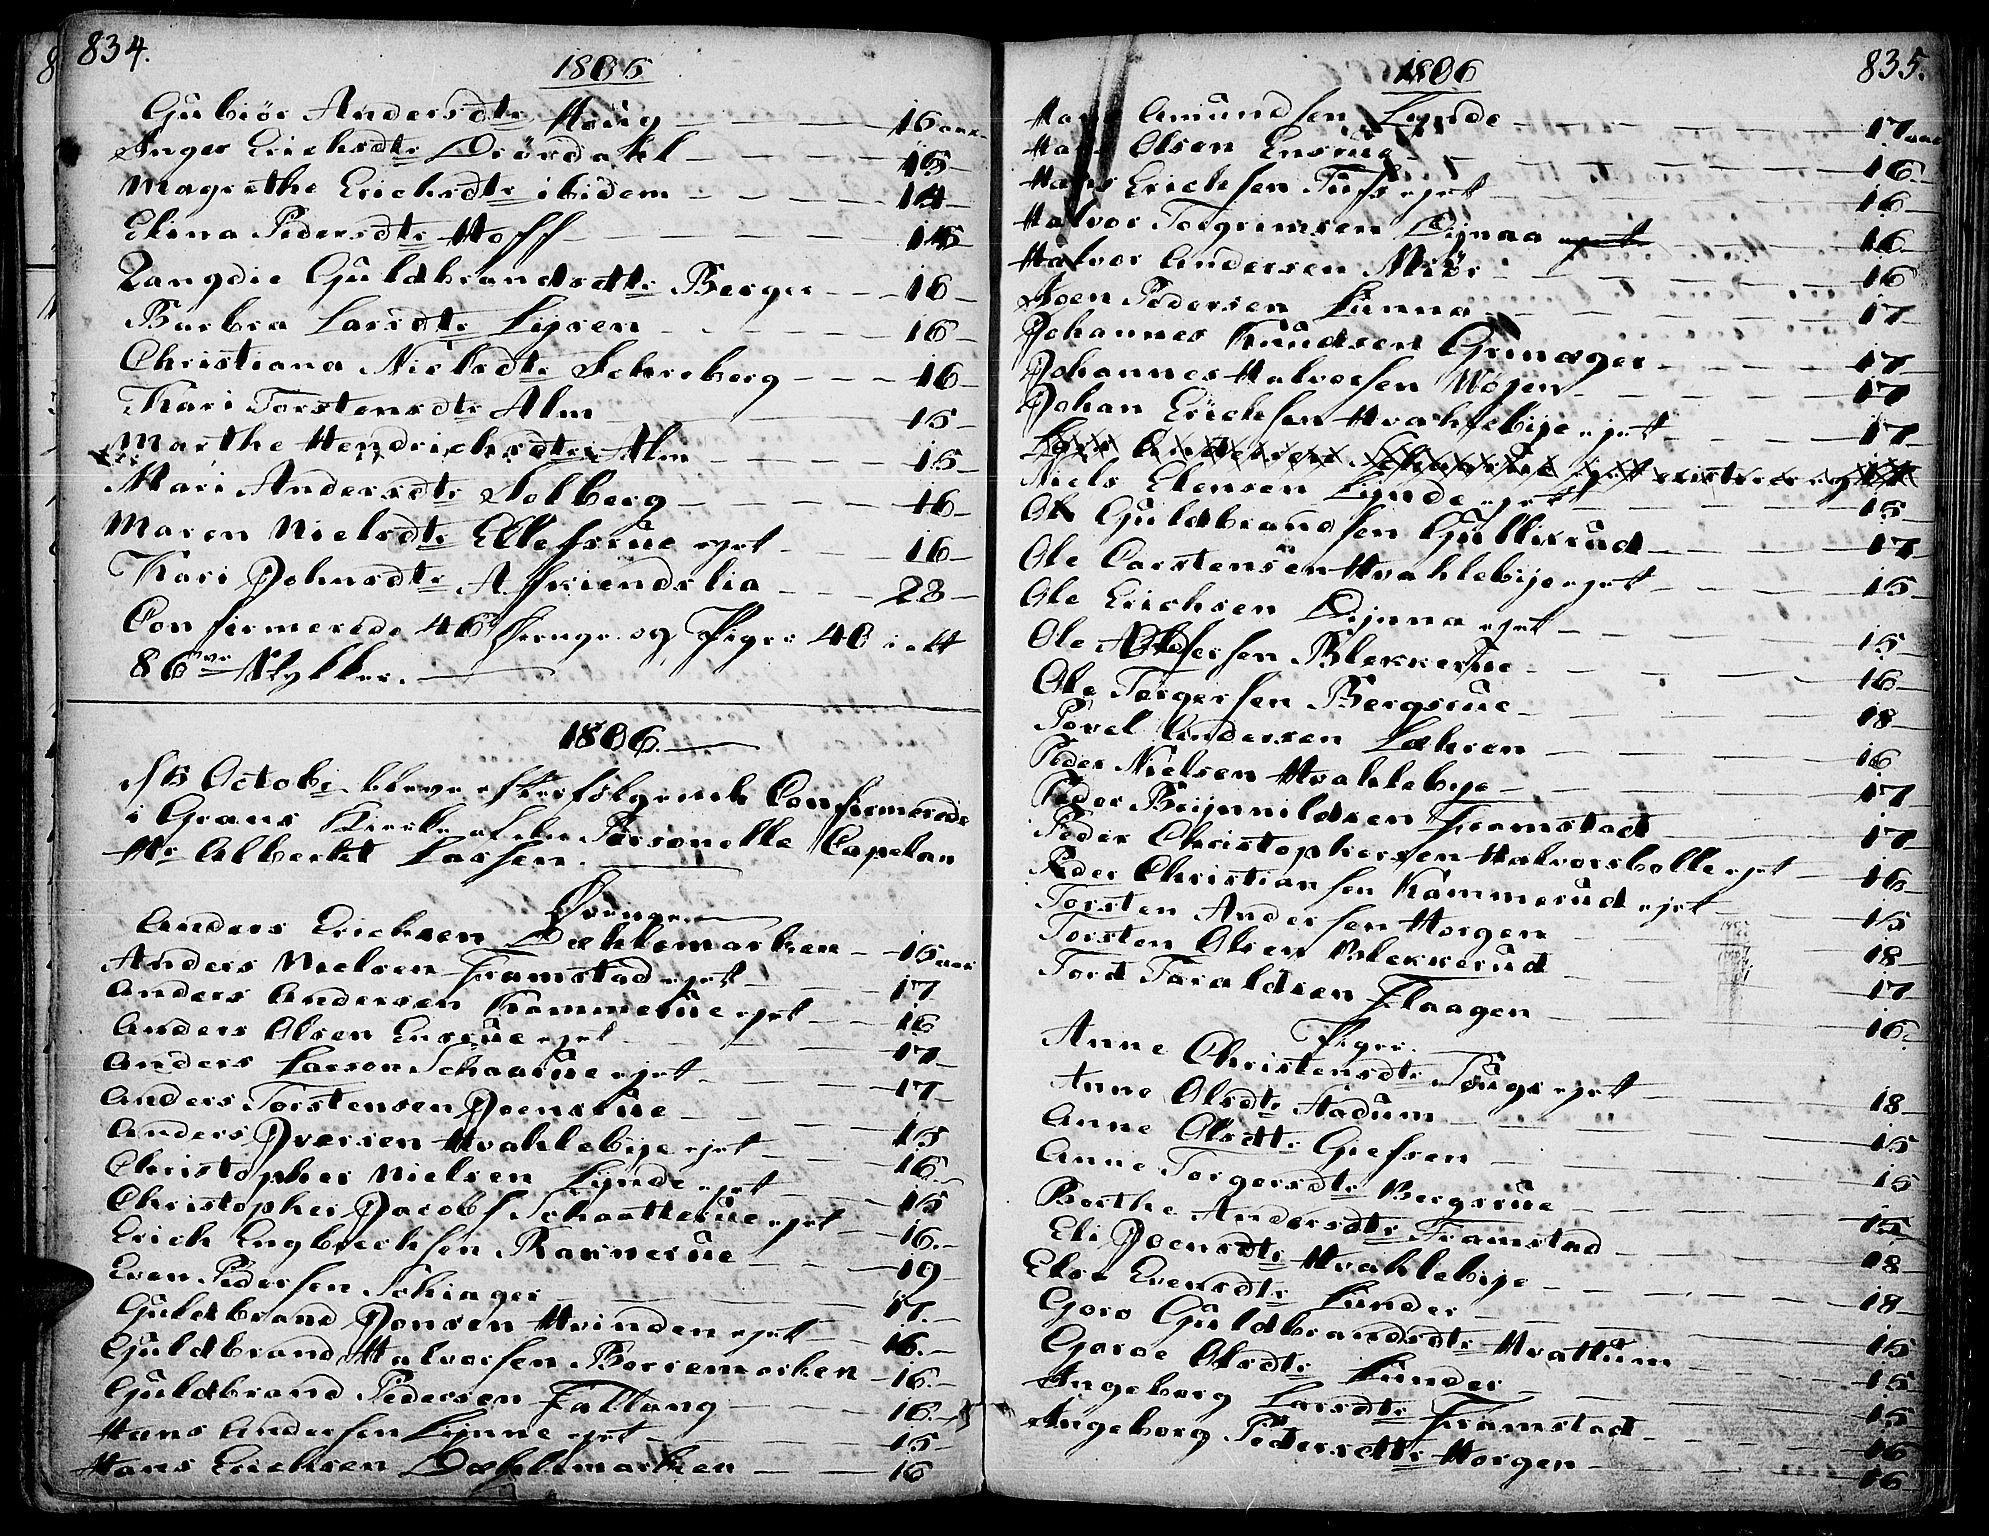 SAH, Gran prestekontor, Ministerialbok nr. 6, 1787-1824, s. 834-835